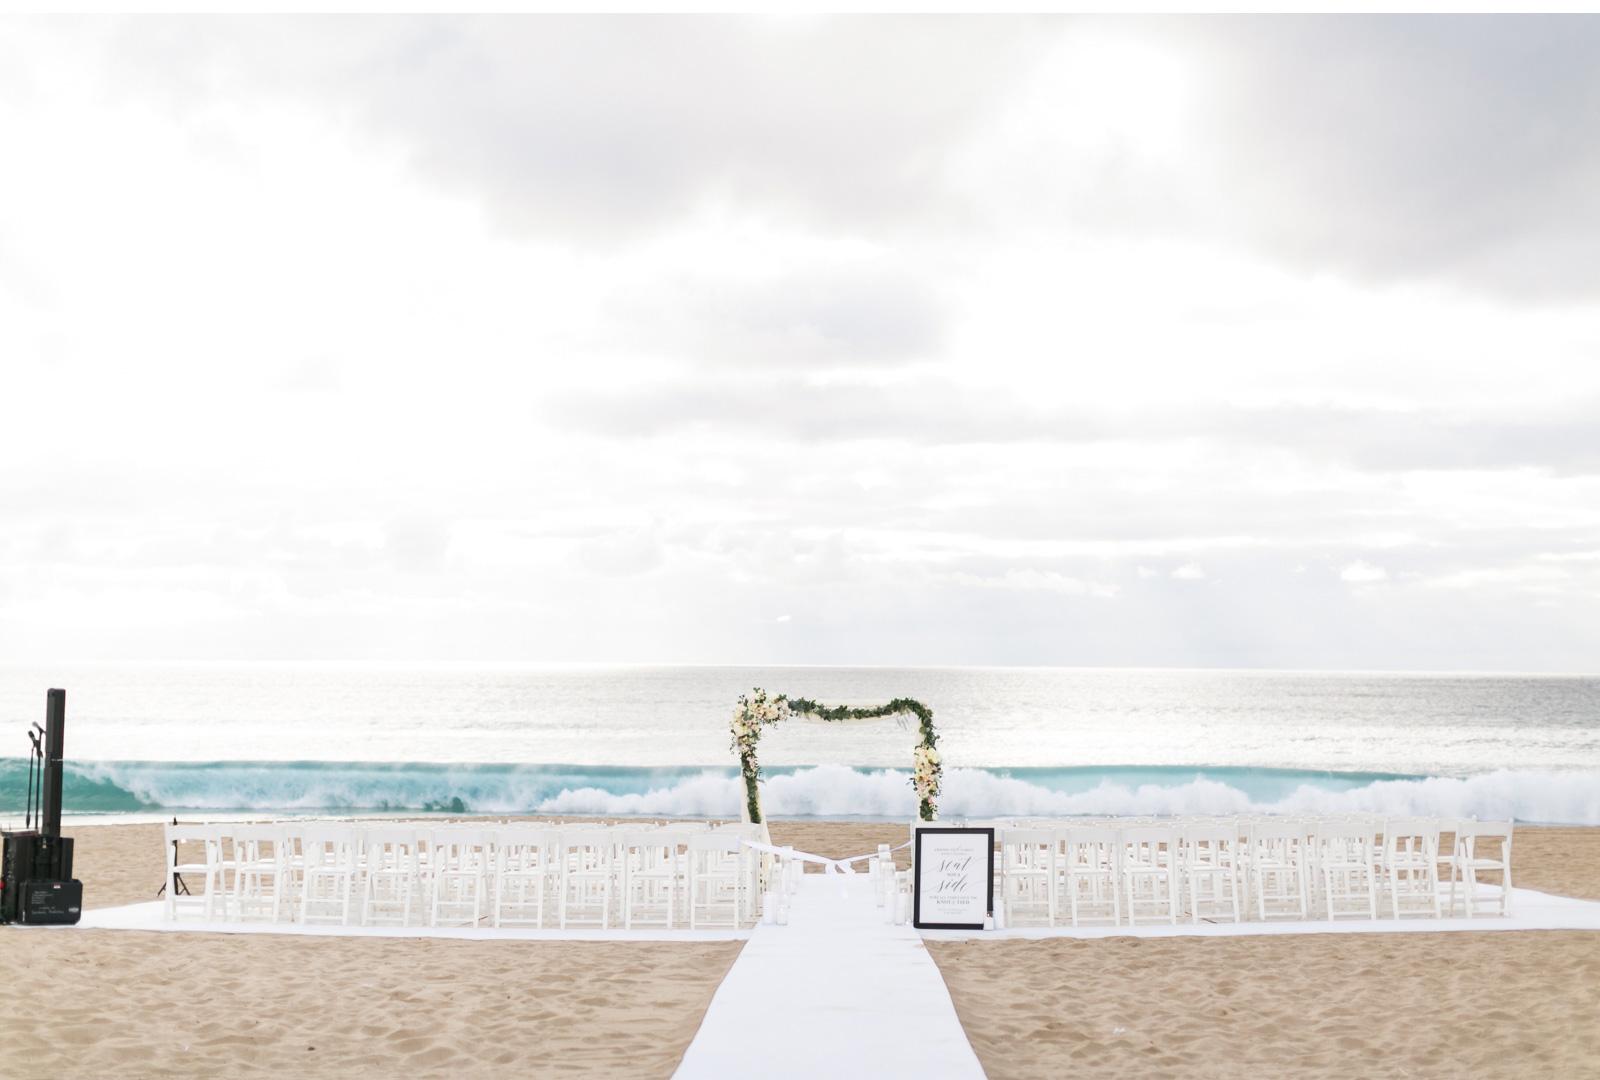 Sunset-Restaurant-Malibu-Beach-Wedding-Natalie-Schutt-Photography_14.jpg